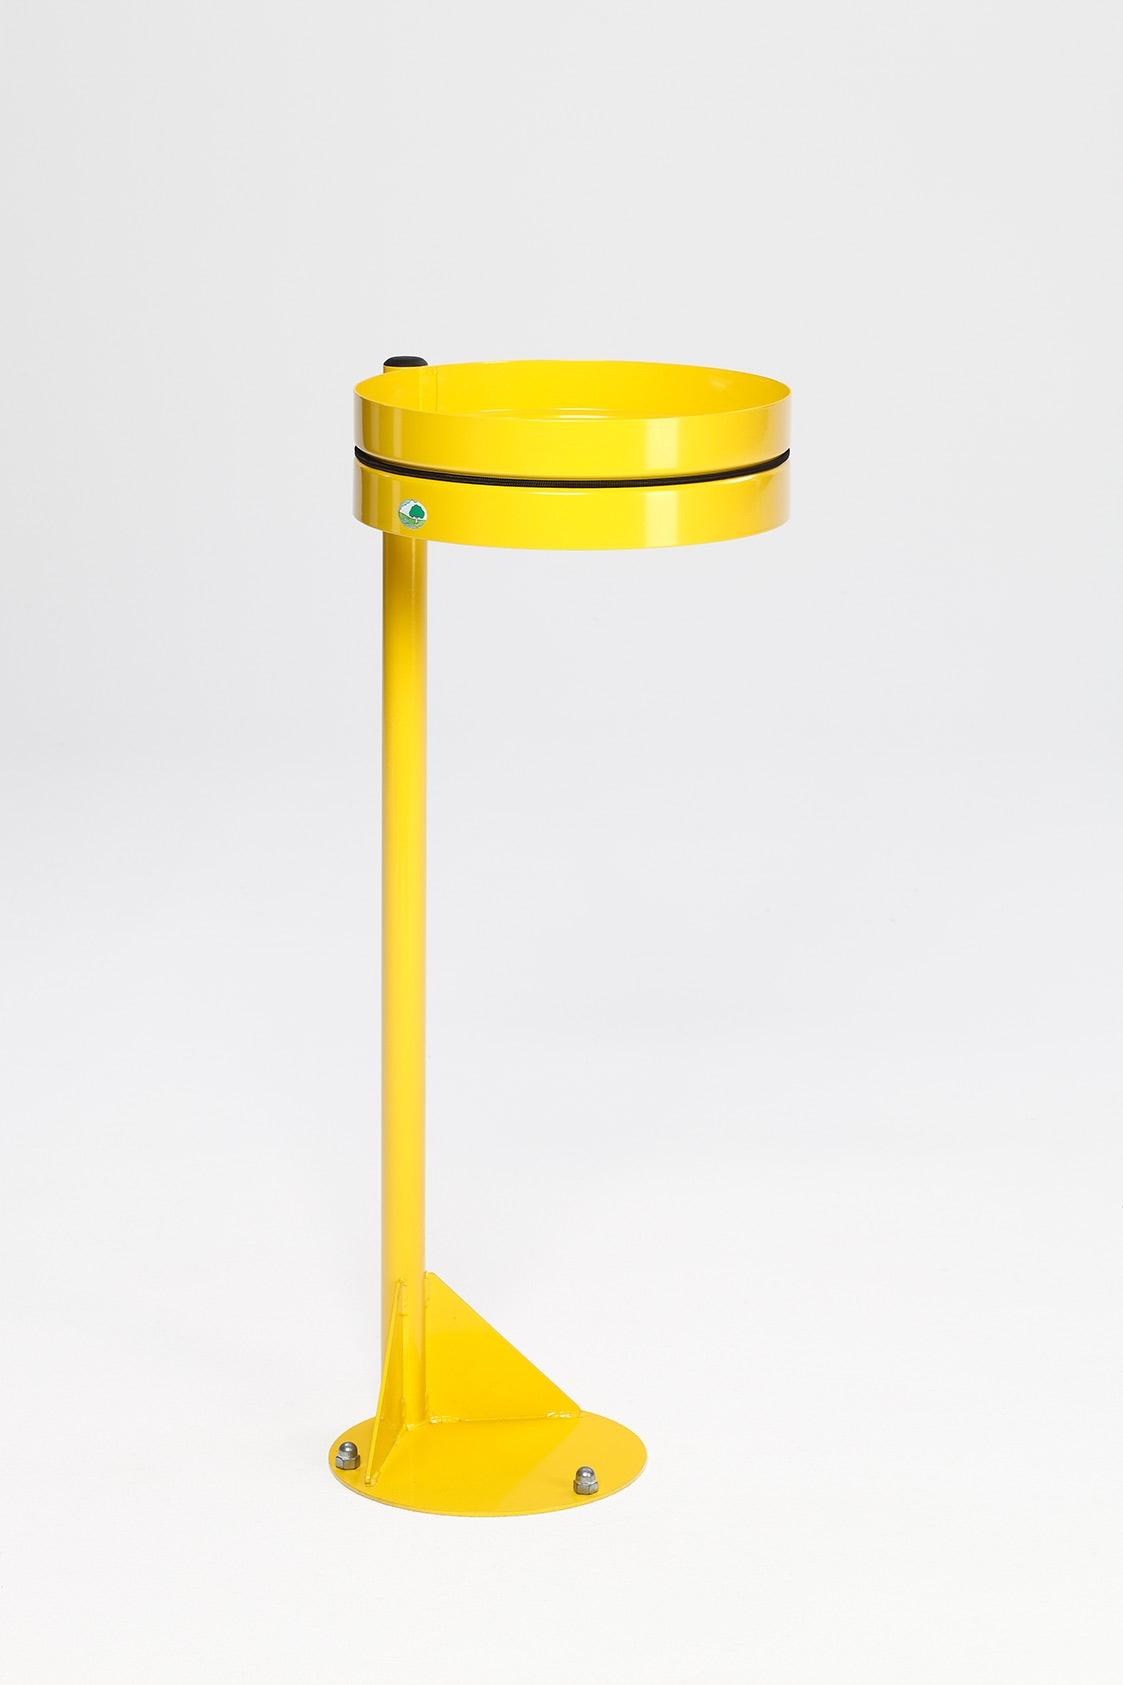 support sac poubelle mural vigipirate jaune. Black Bedroom Furniture Sets. Home Design Ideas